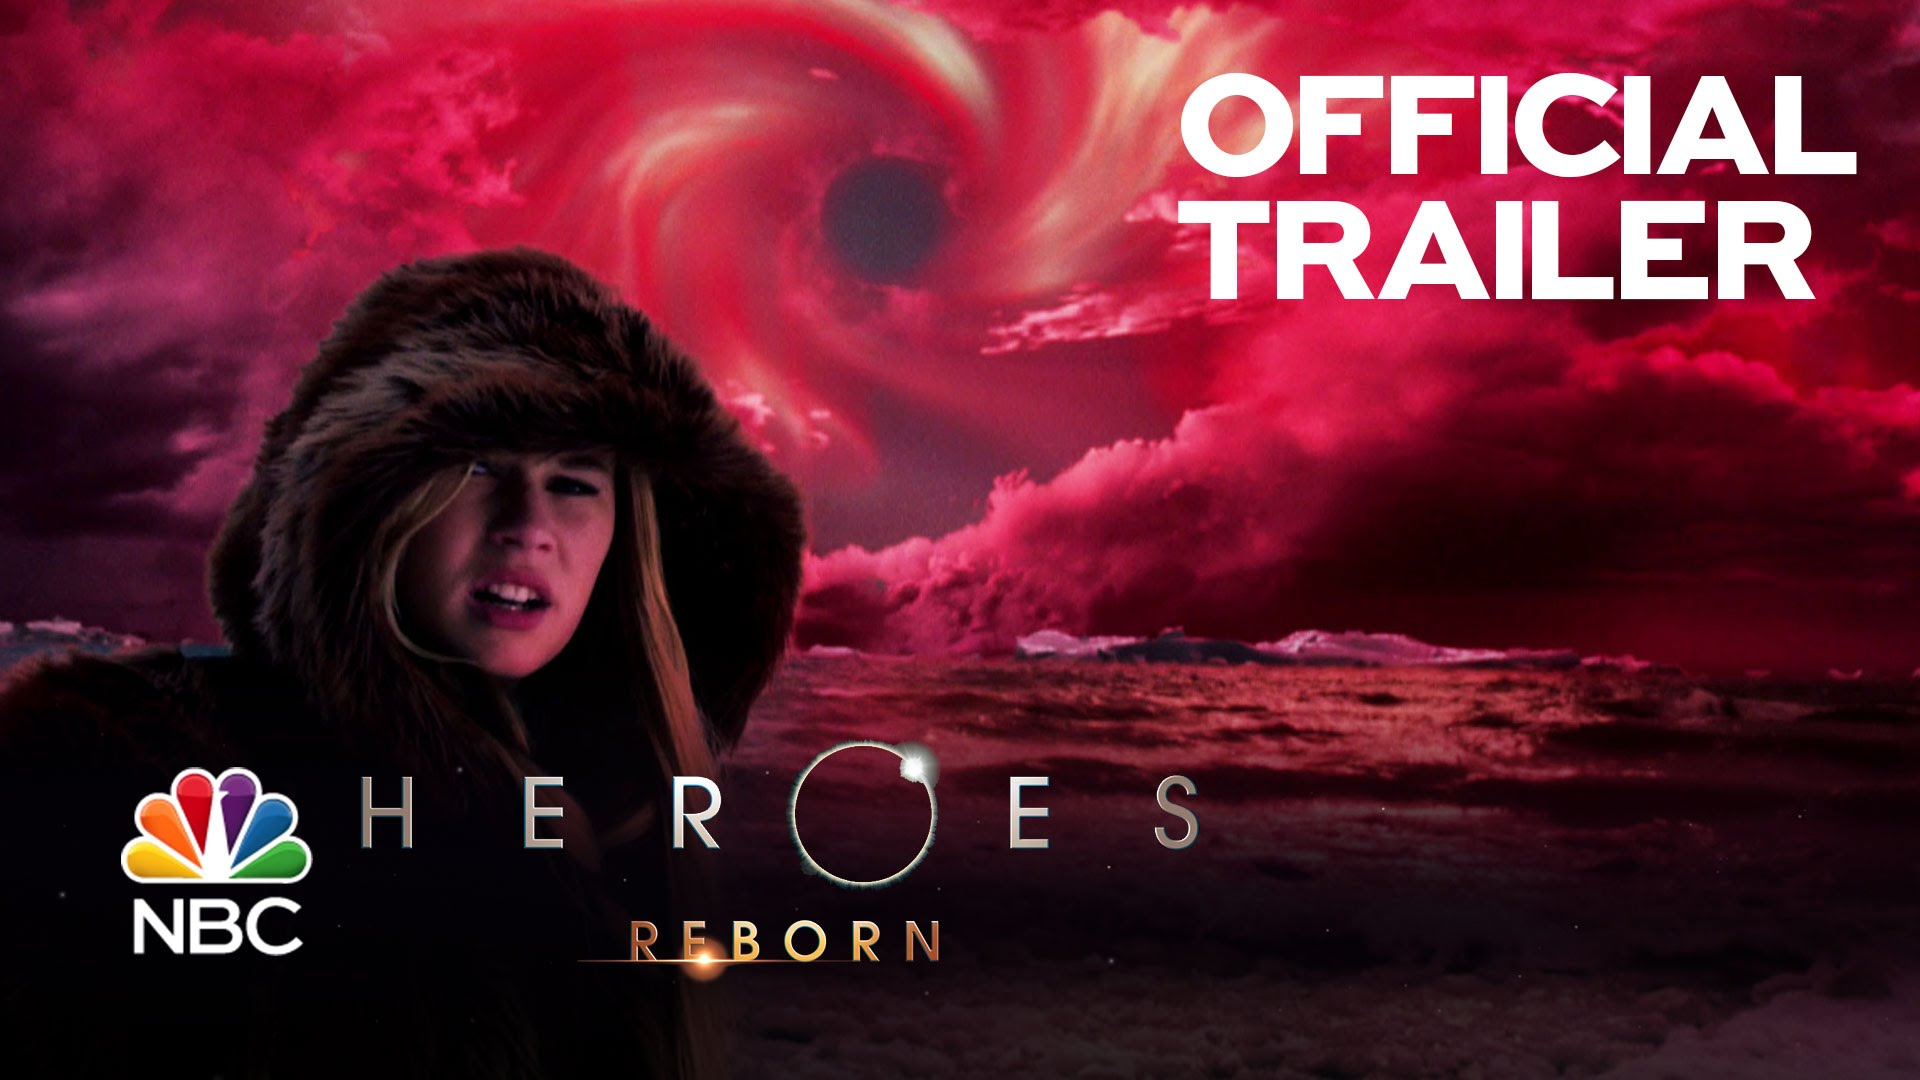 SDCC15: Offizieller Trailer – HEROES REBORN